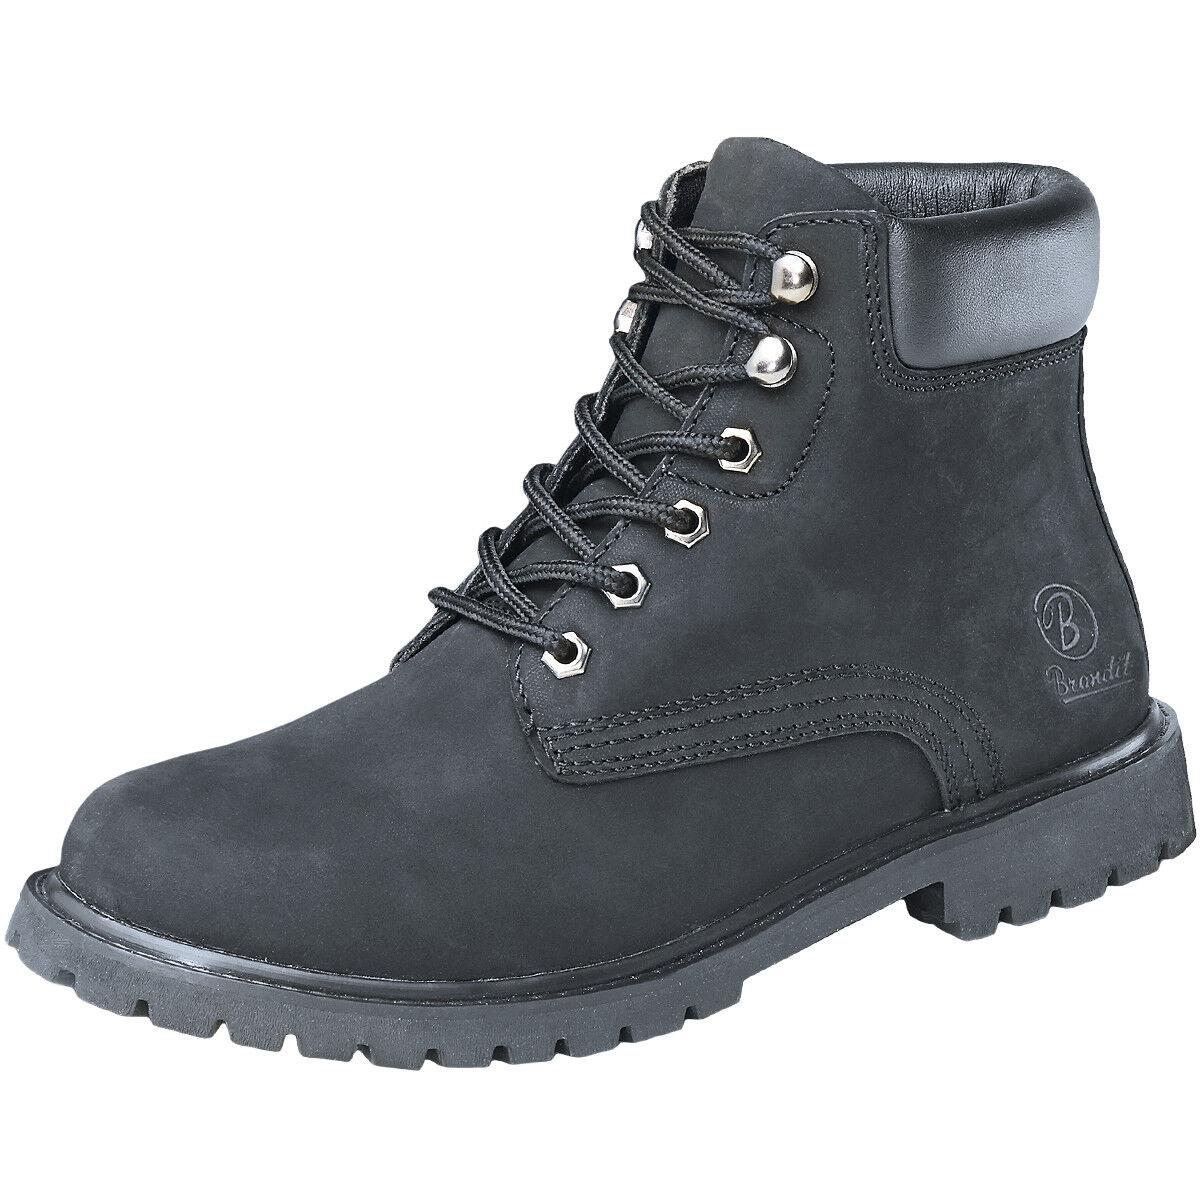 Brandit Kenyon Mens Security Boots Padded Suede Leather Vintage Footwear Black